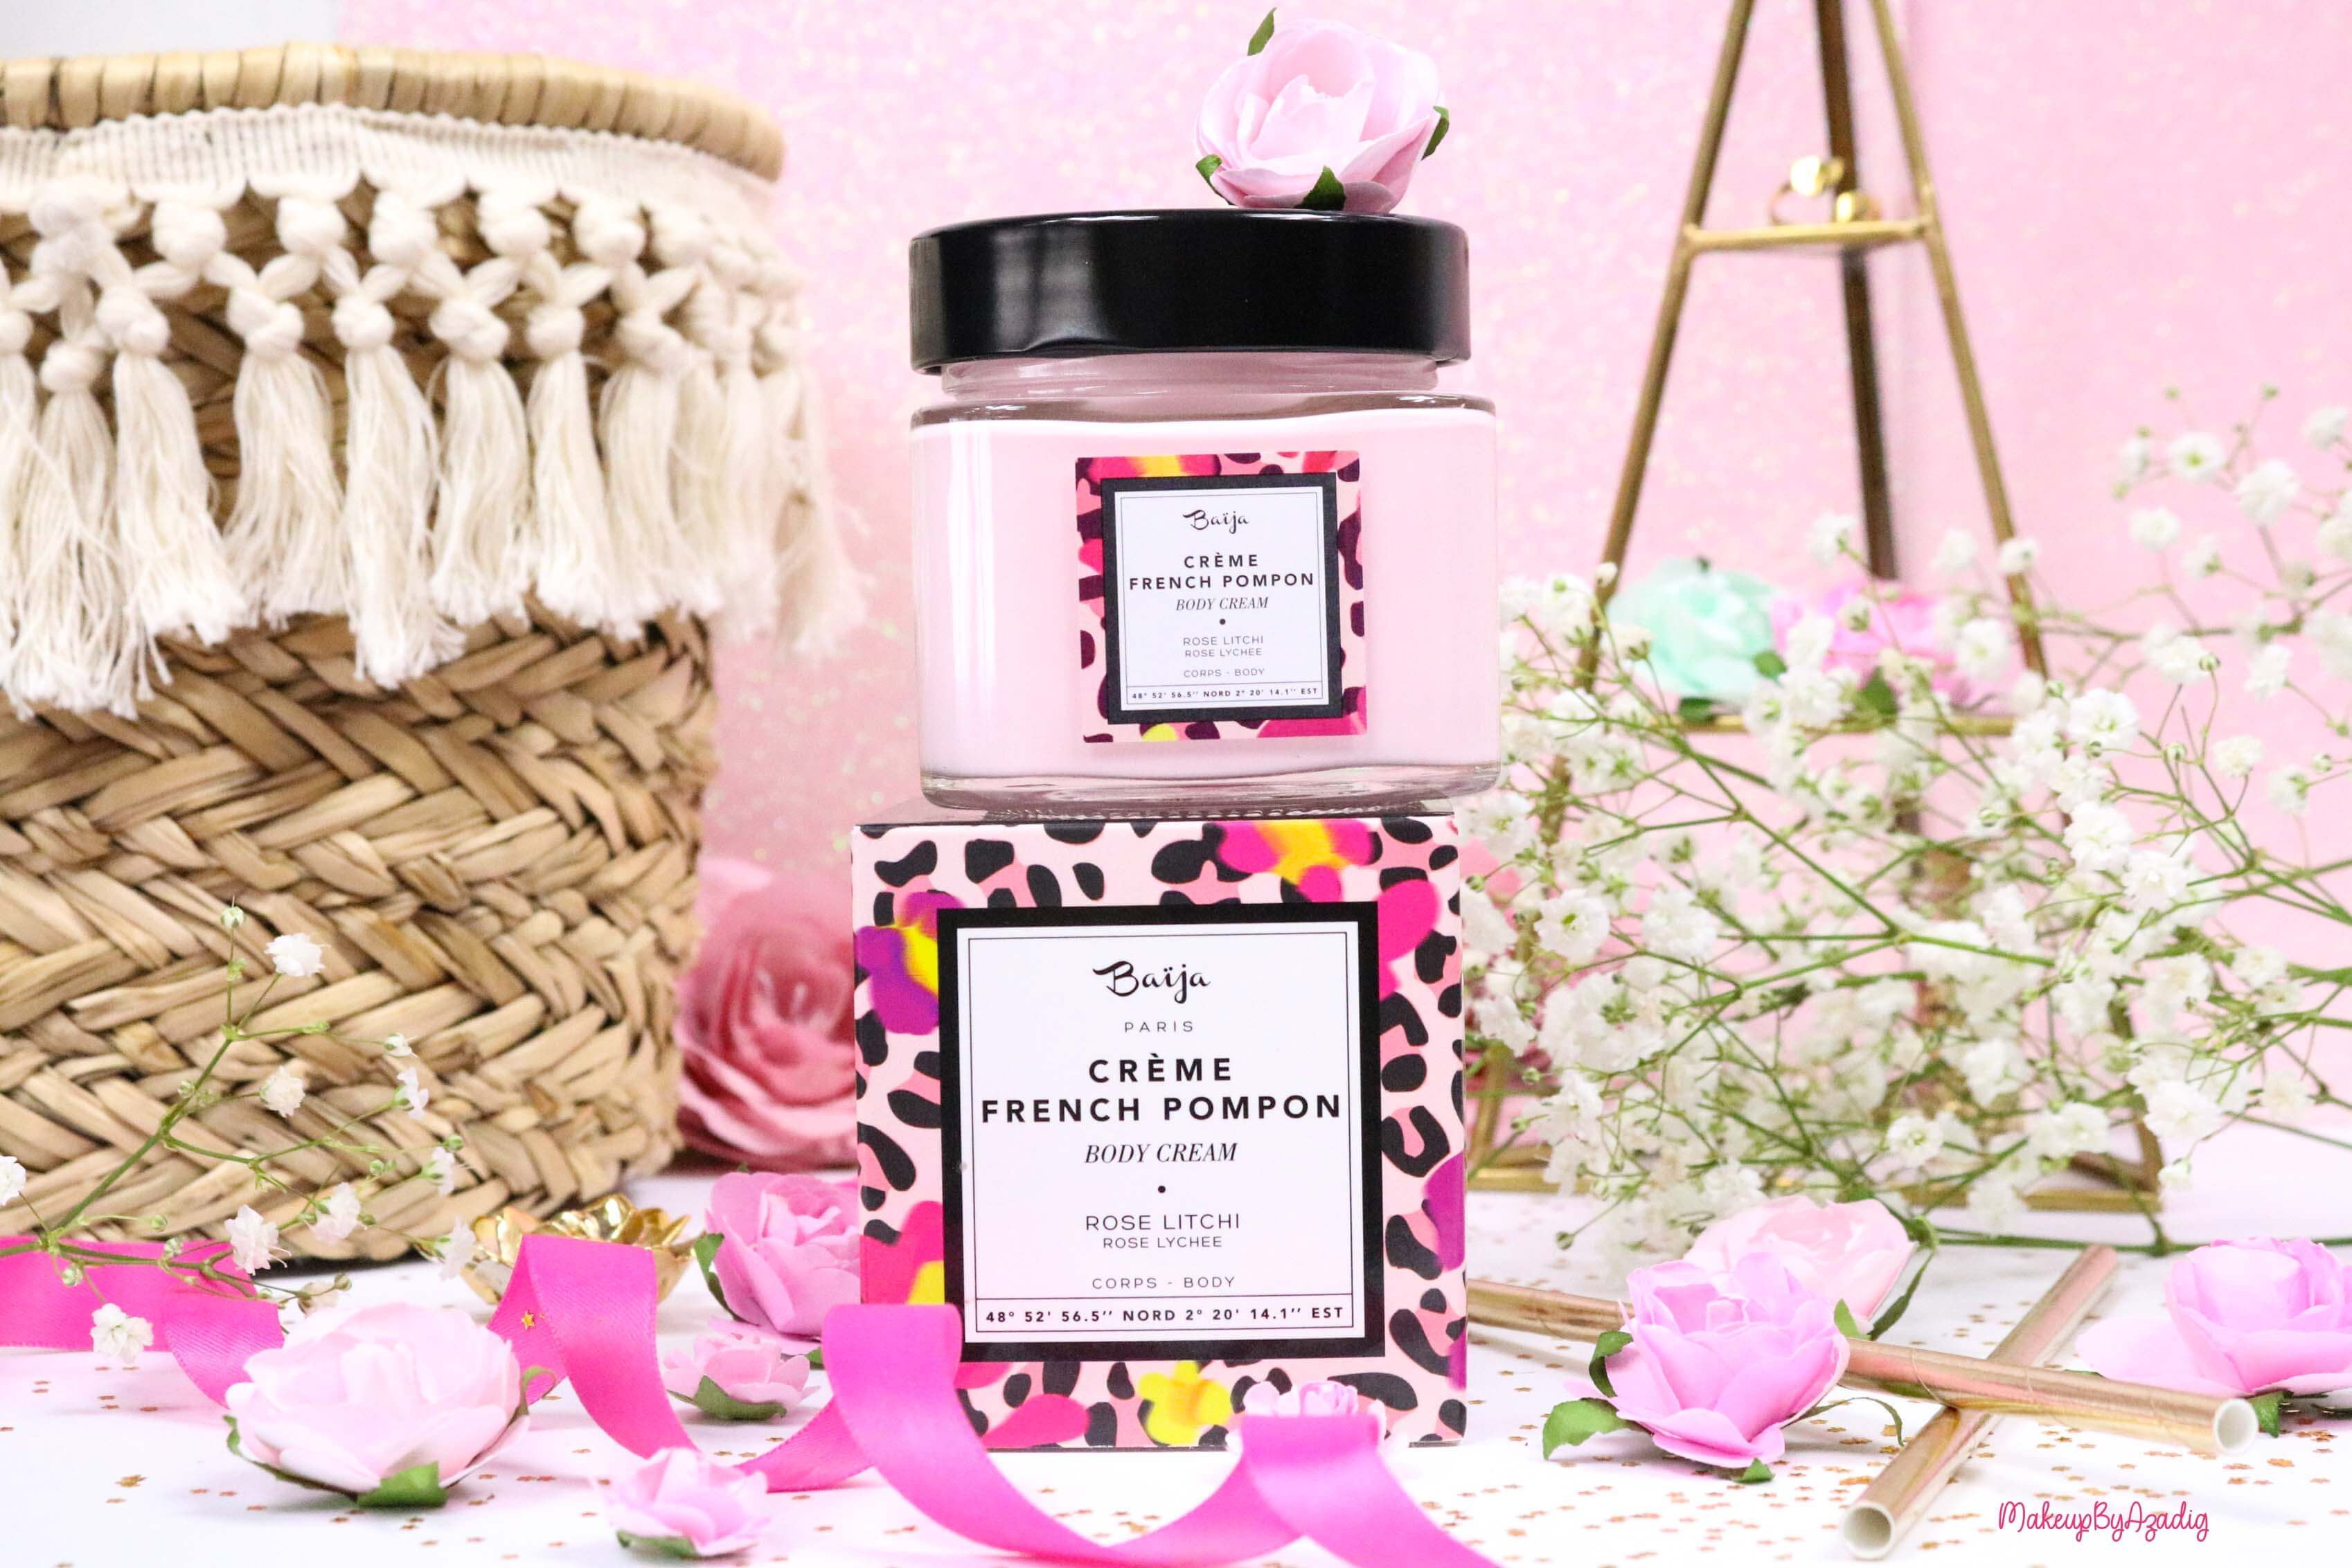 revue-creme-corps-hydratant-french-pompon-baija-rose-litchi-sephora-avis-prix-madeinfrance-makeupbyazadig-parfumeur-grasse